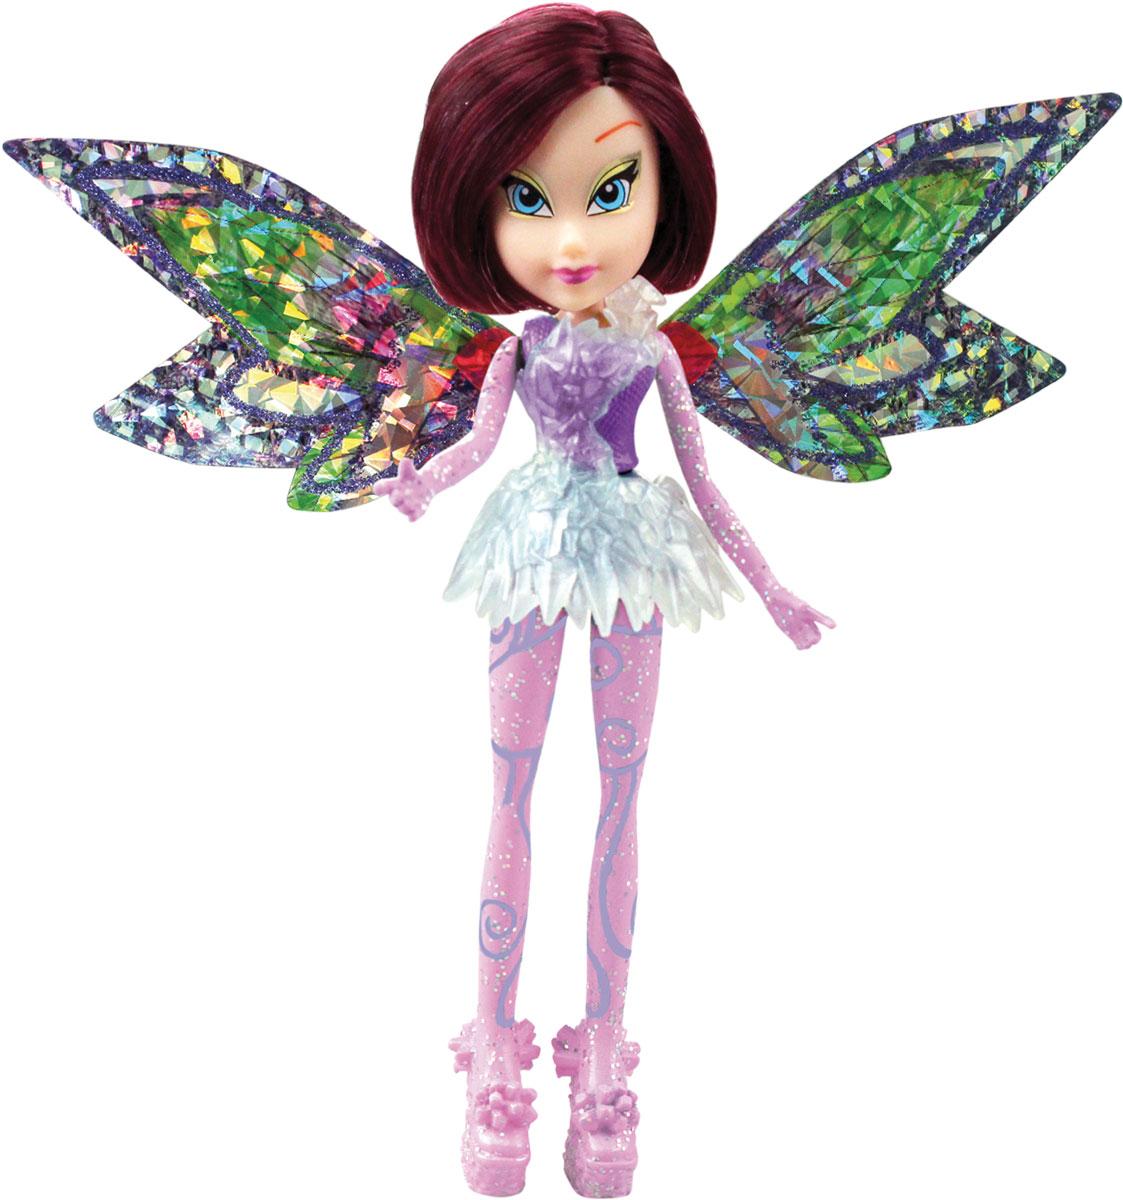 Winx Club Мини-кукла Tecna куклы winx мини фигурки тайникс tecna